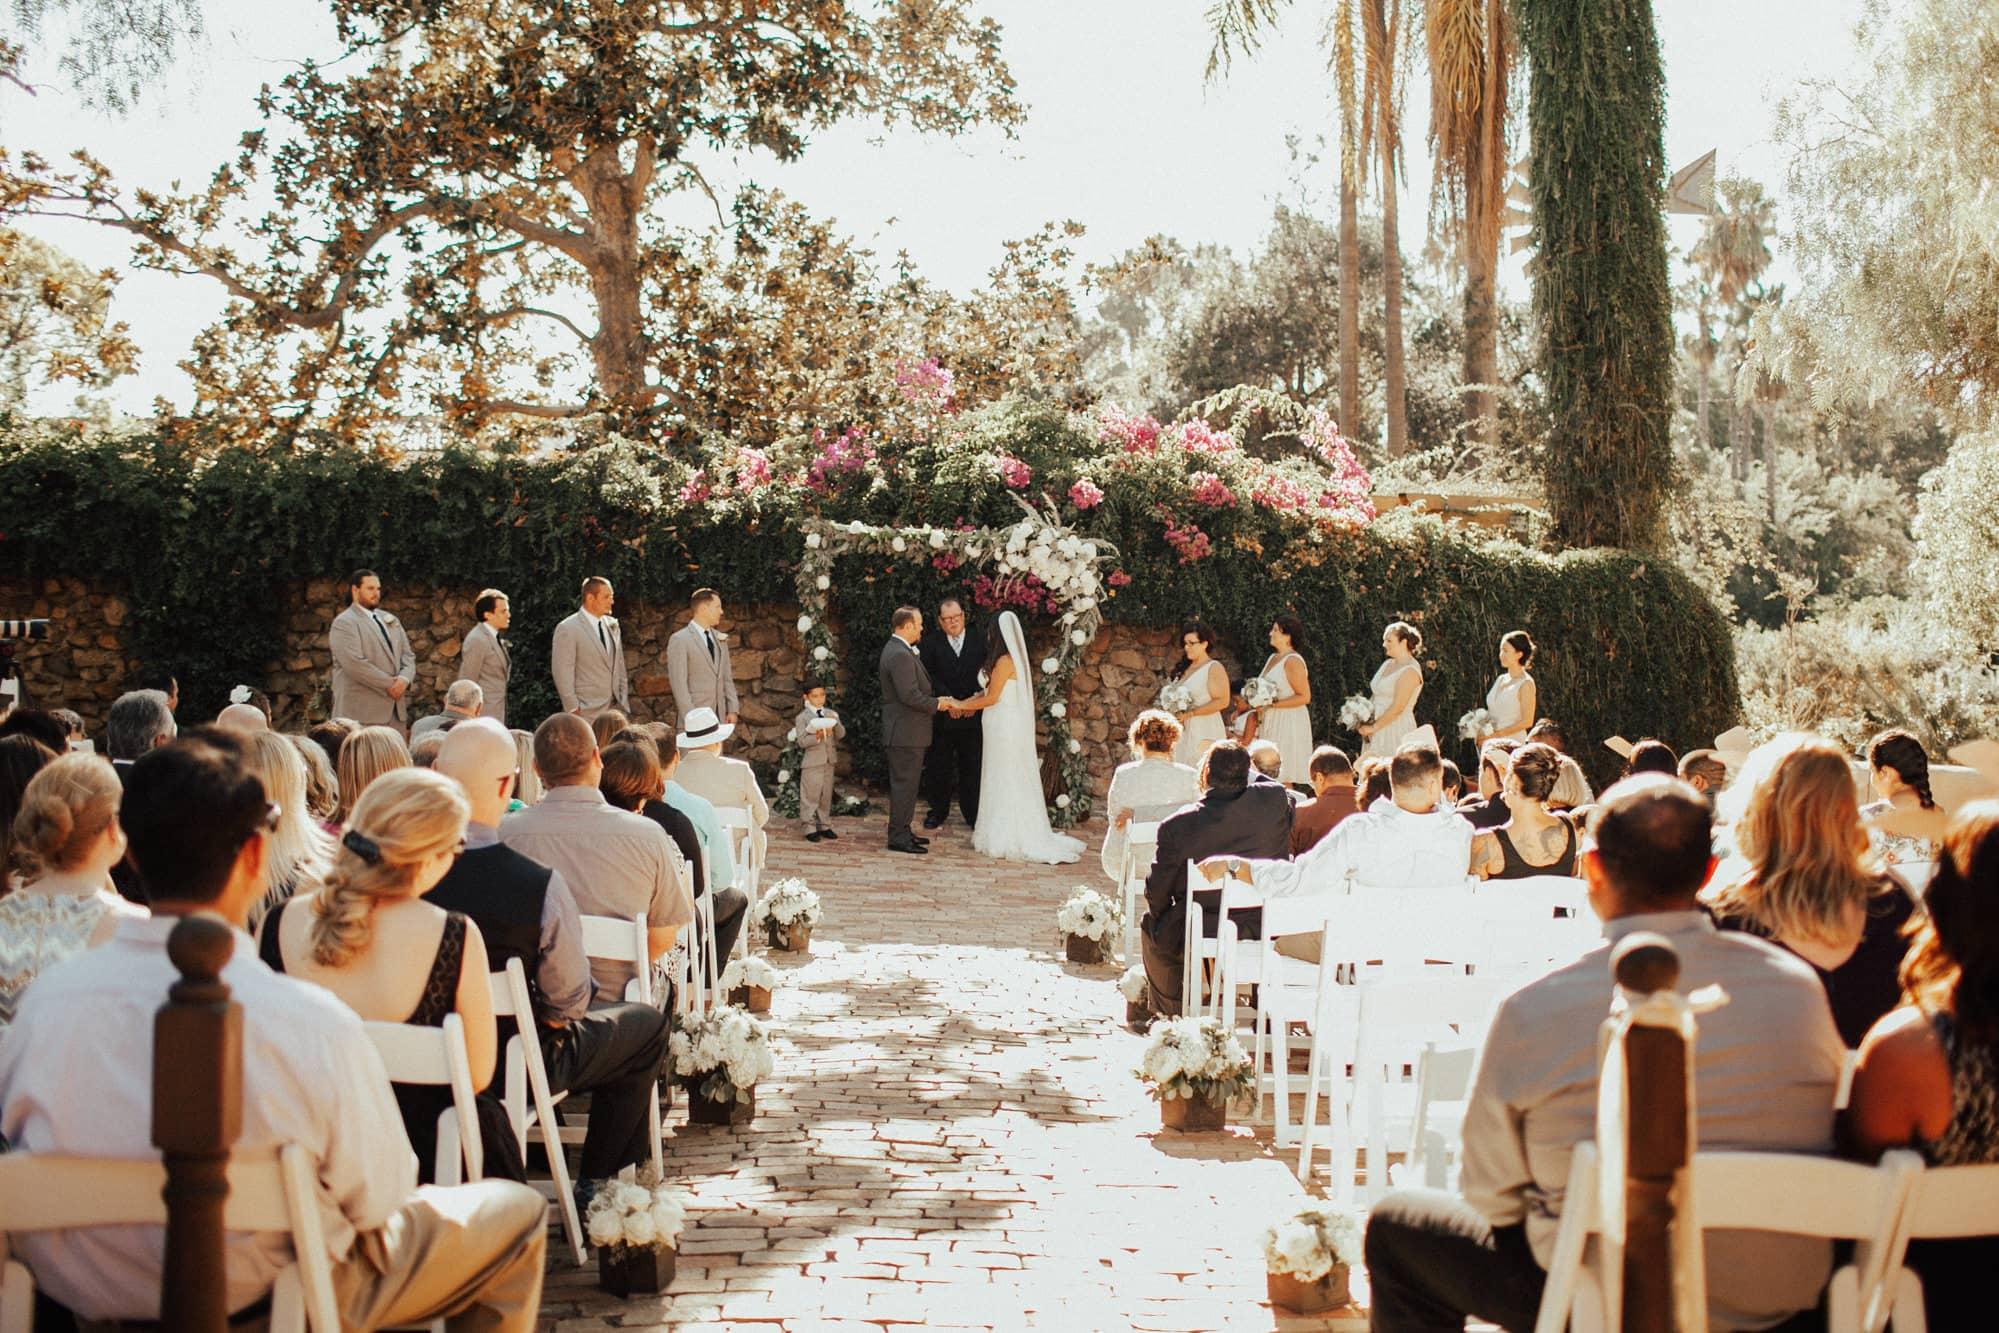 wedding at rancho buena vista adobe